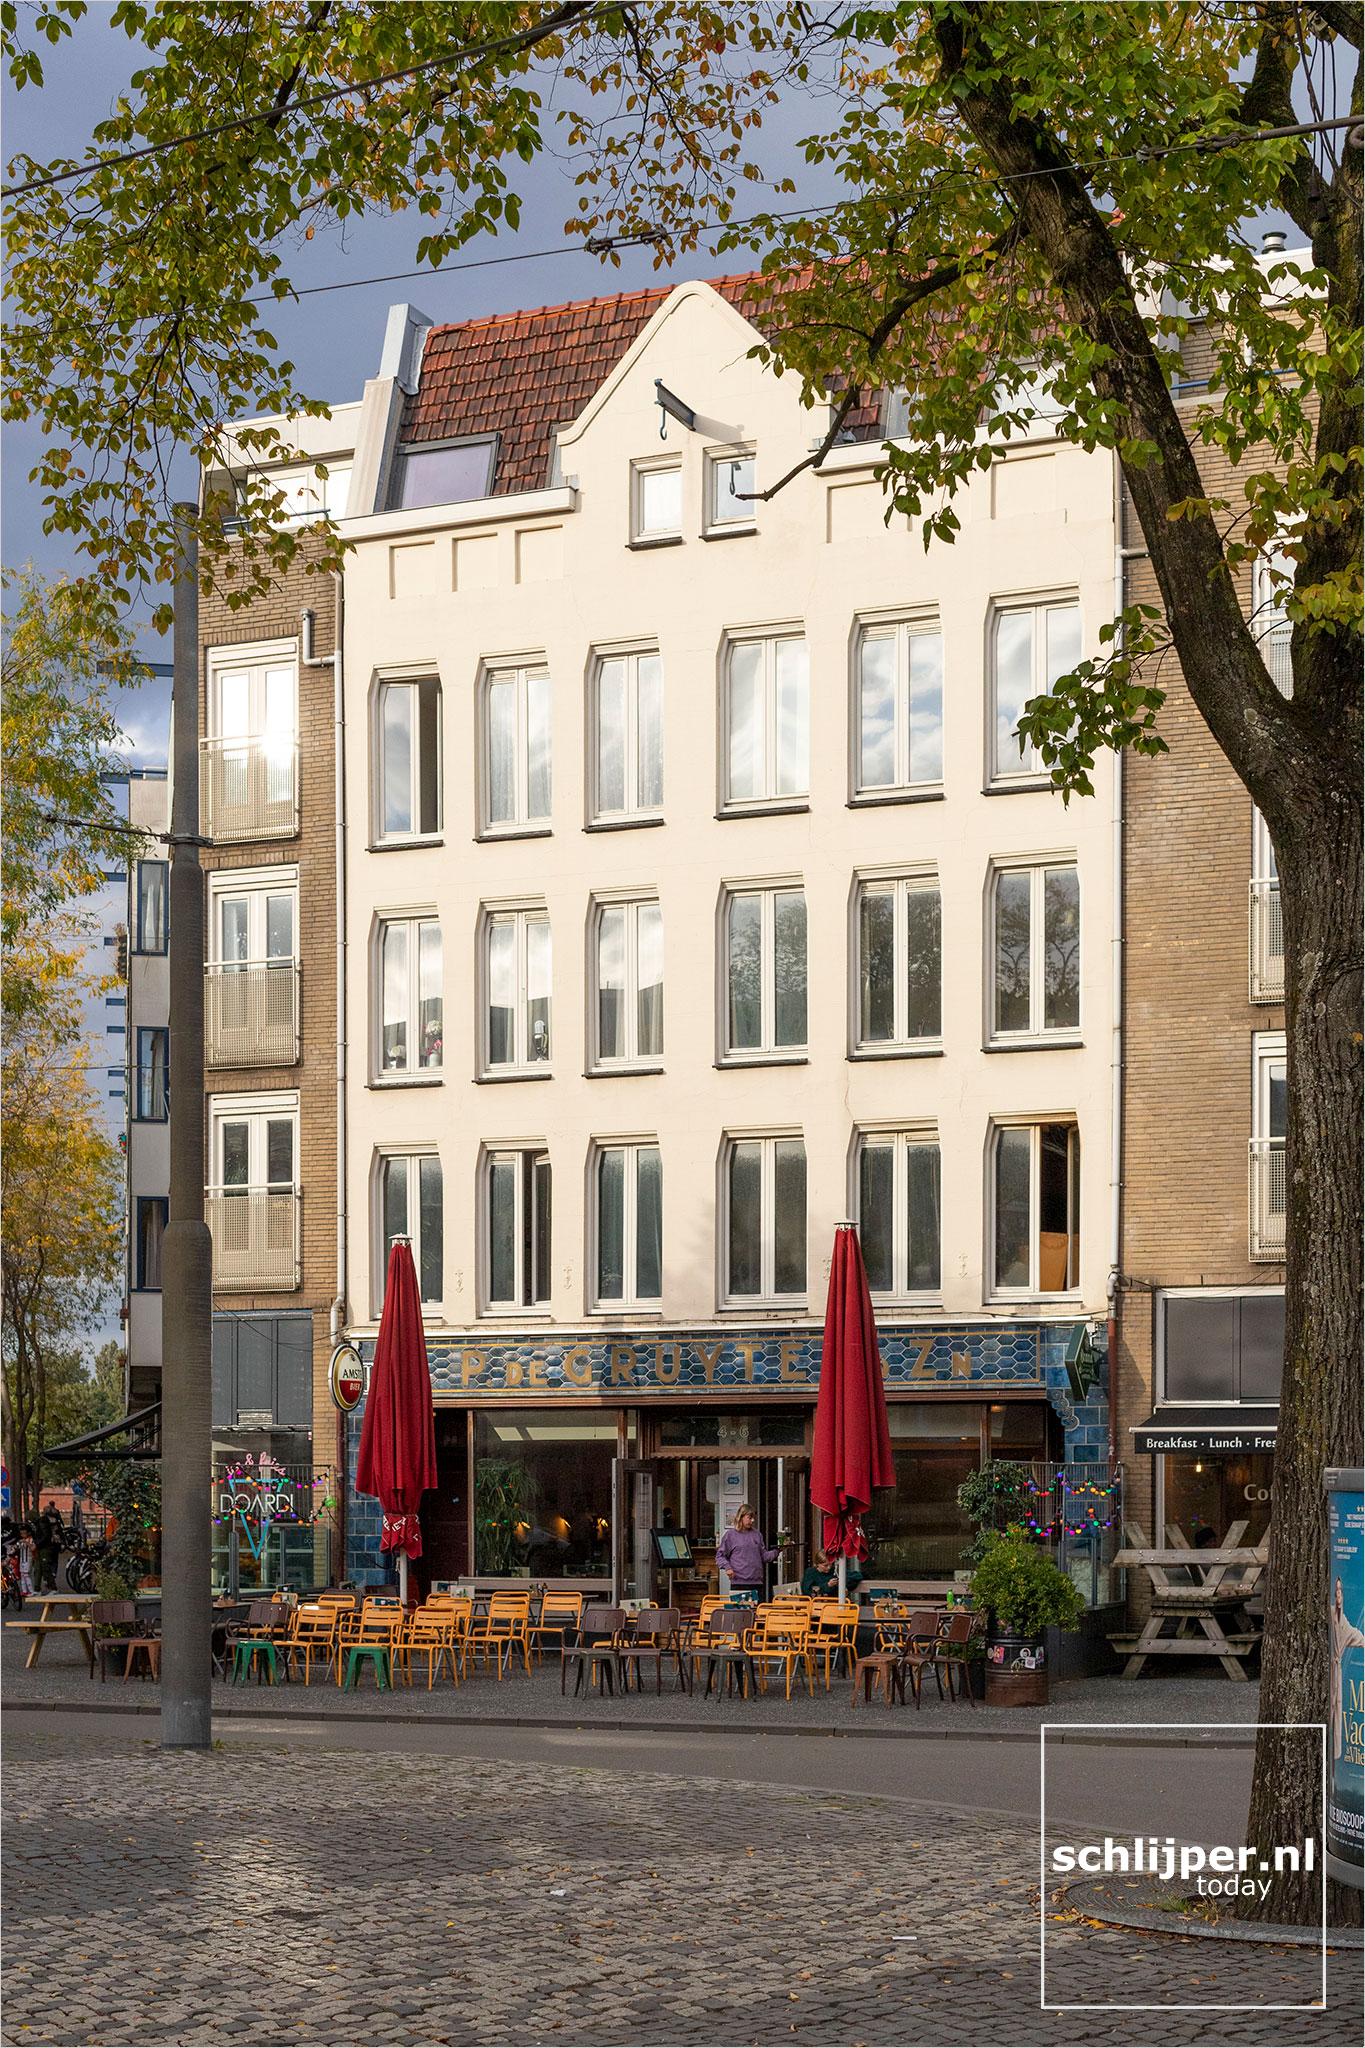 The Netherlands, Amsterdam, 4 oktober 2021